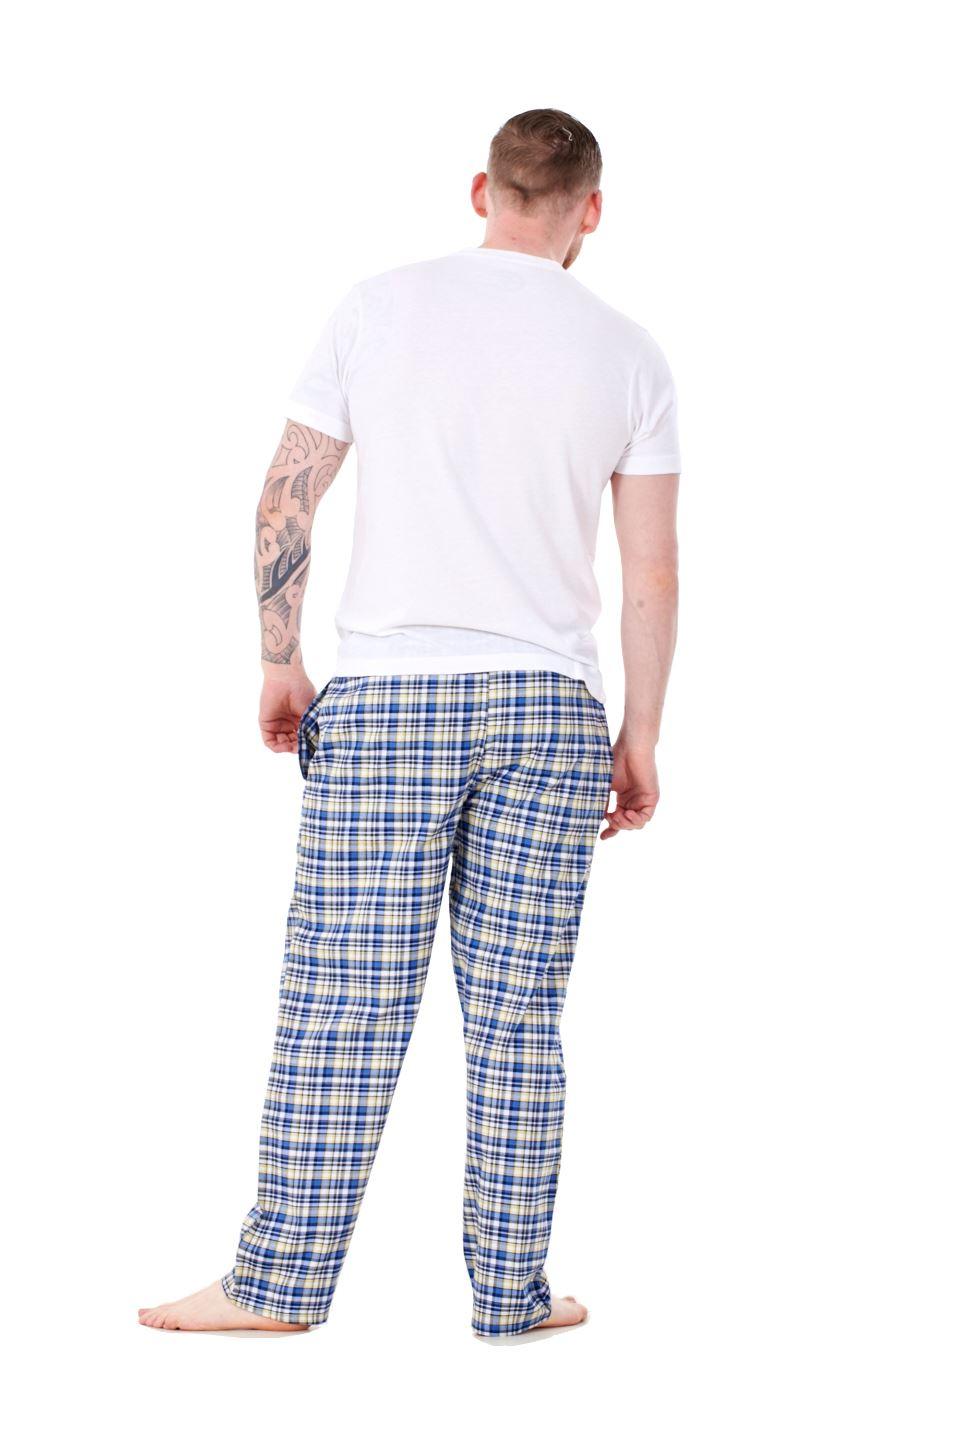 Mens-Pyjama-Bottoms-Rich-Cotton-Woven-Check-Lounge-Pant-Nightwear-Big-3XL-to-5XL Indexbild 22